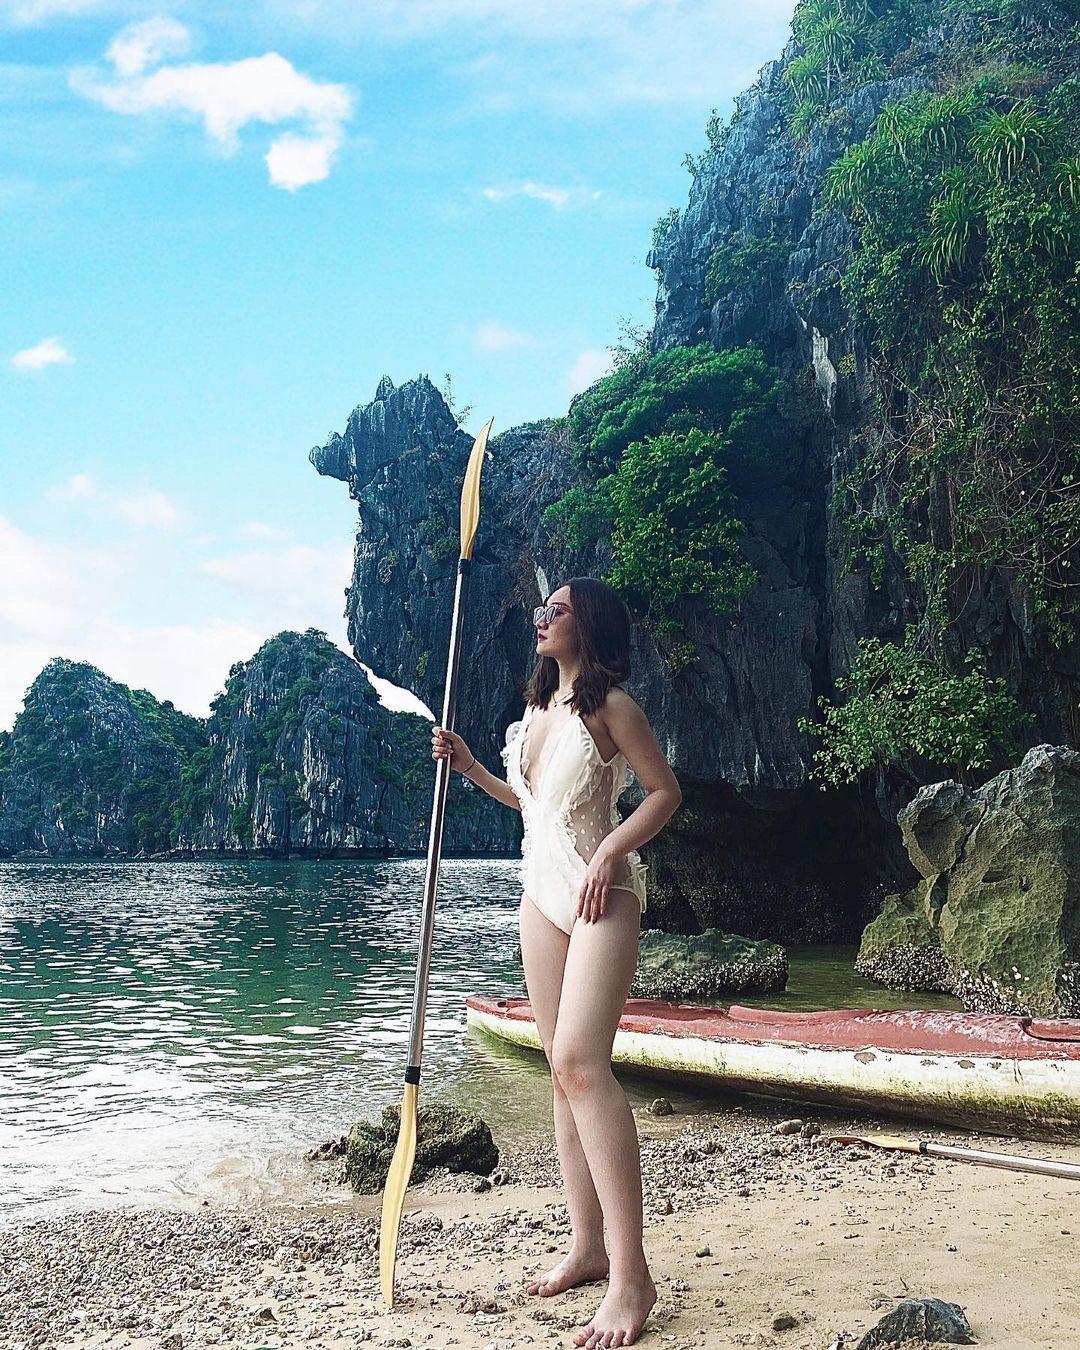 cheo thuyen kayak vinh lan ha